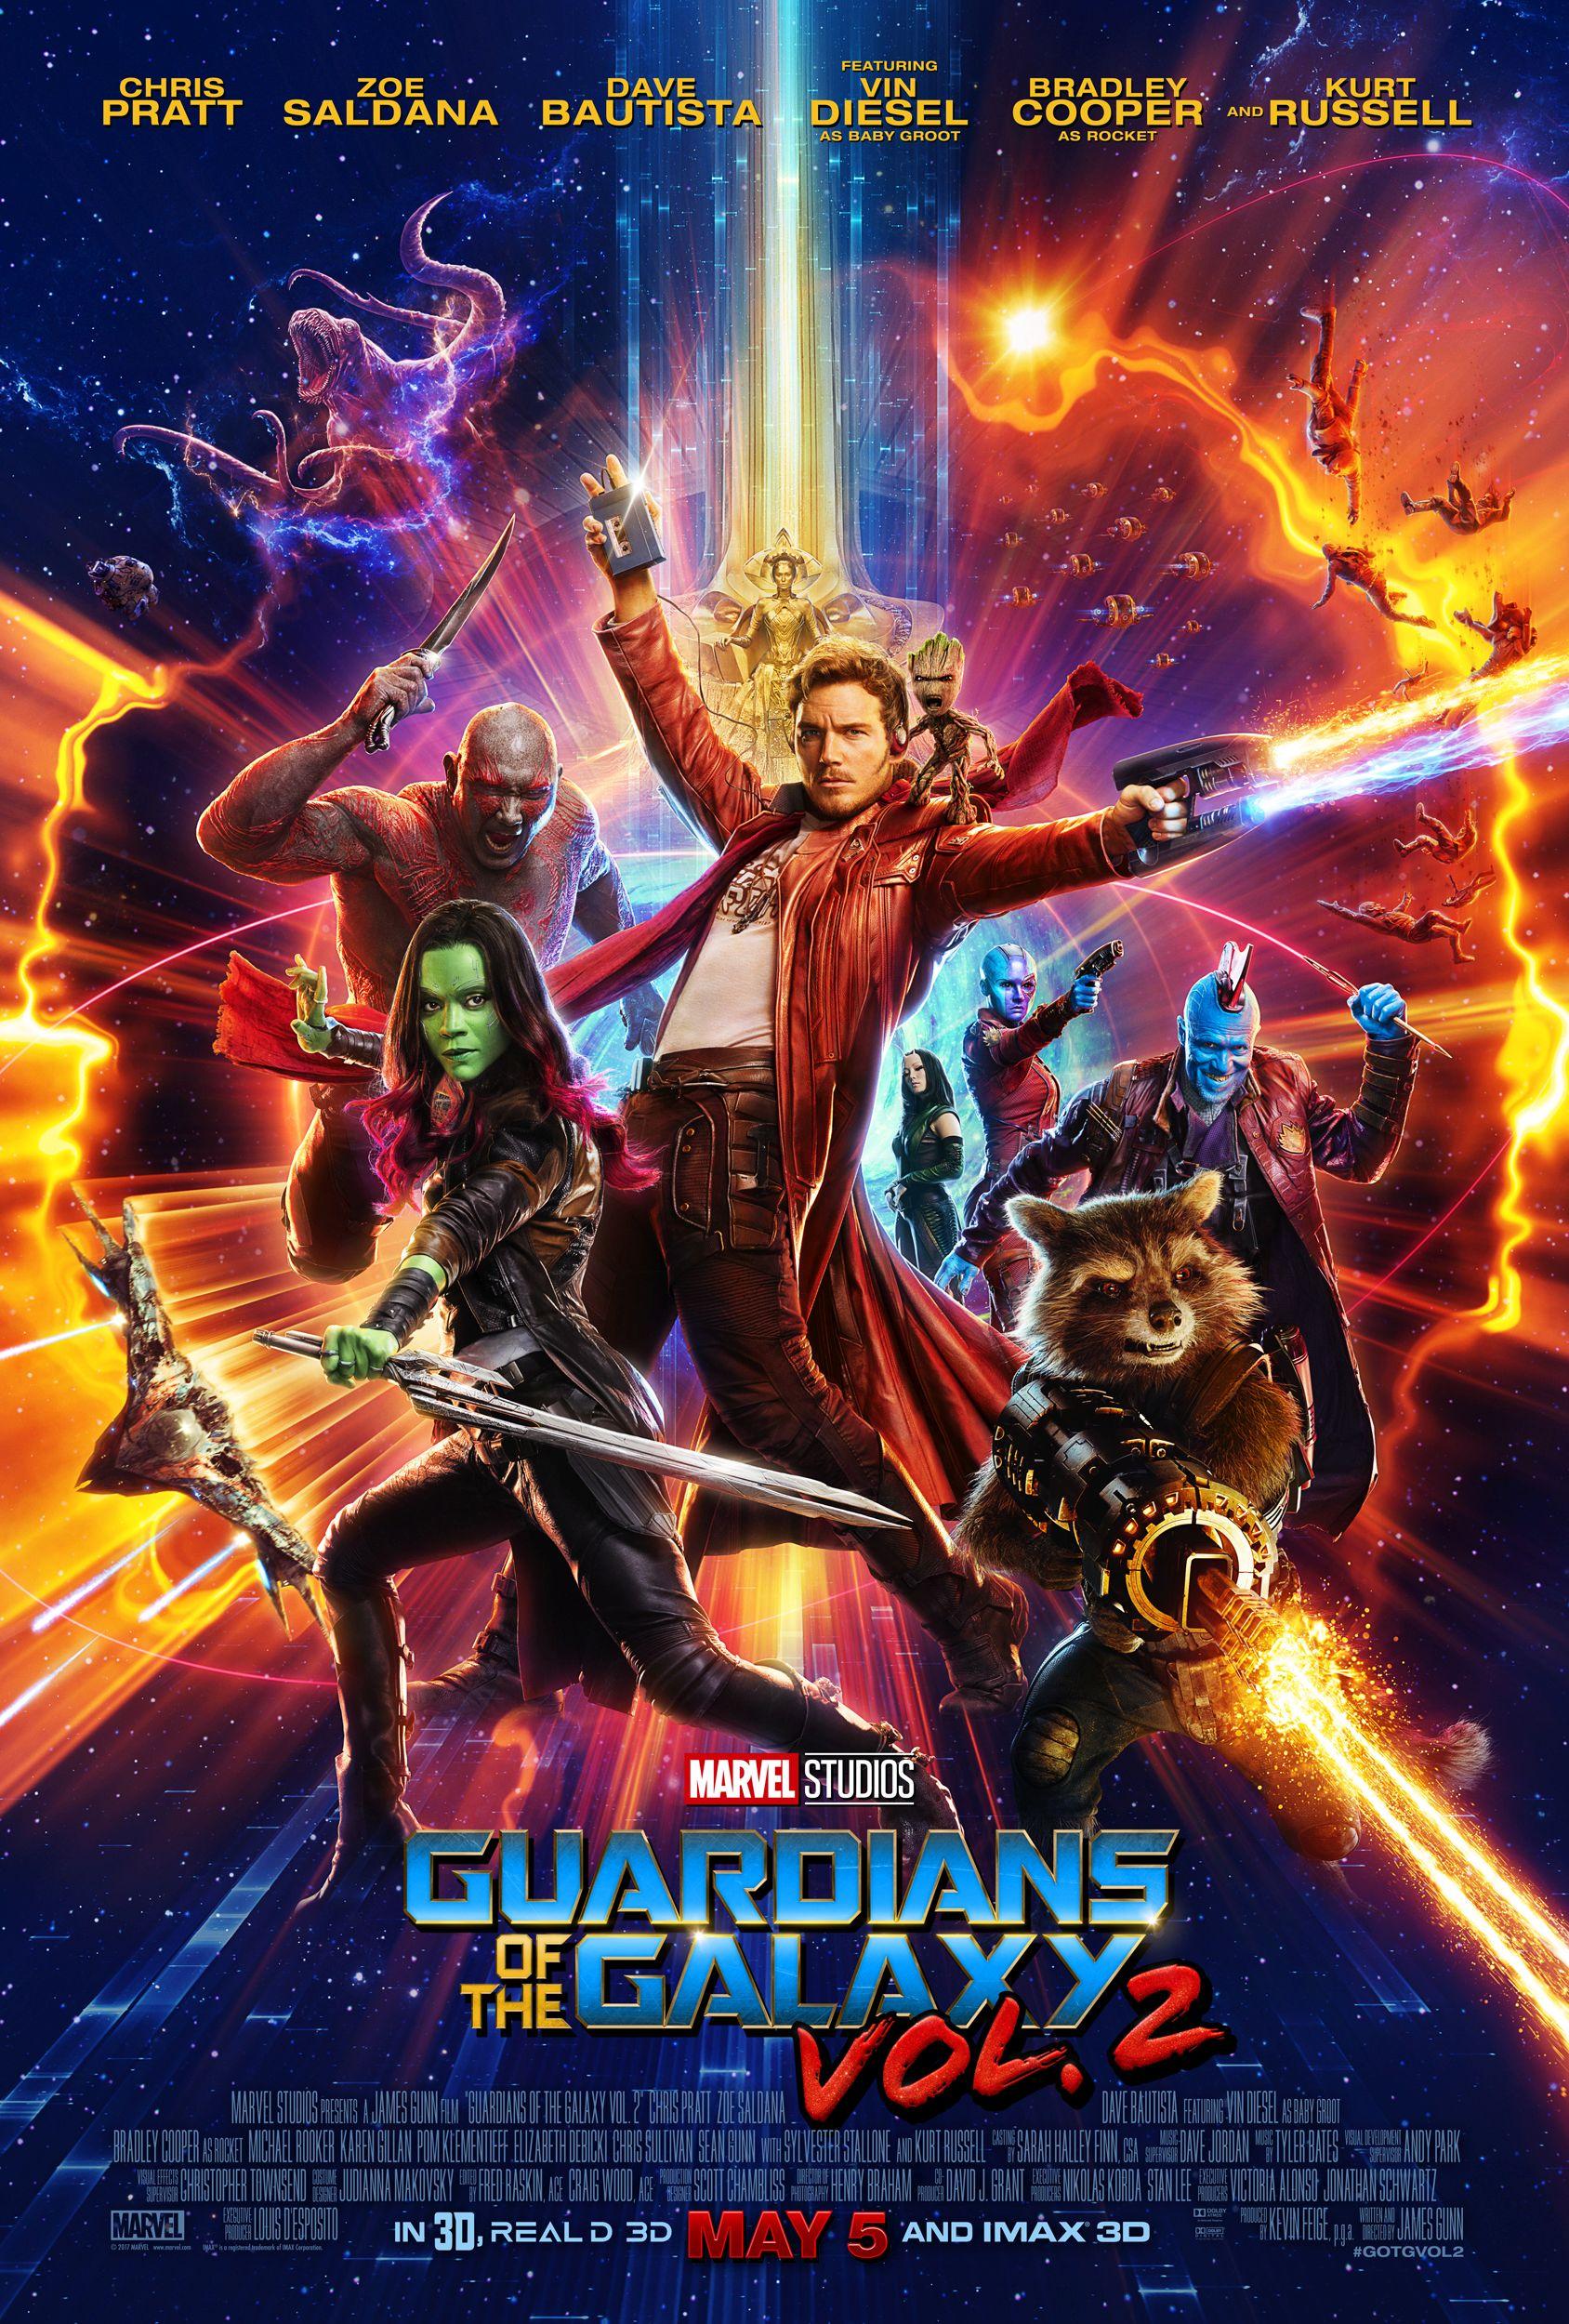 guardians_of_the_galaxy_vol_2.jpg